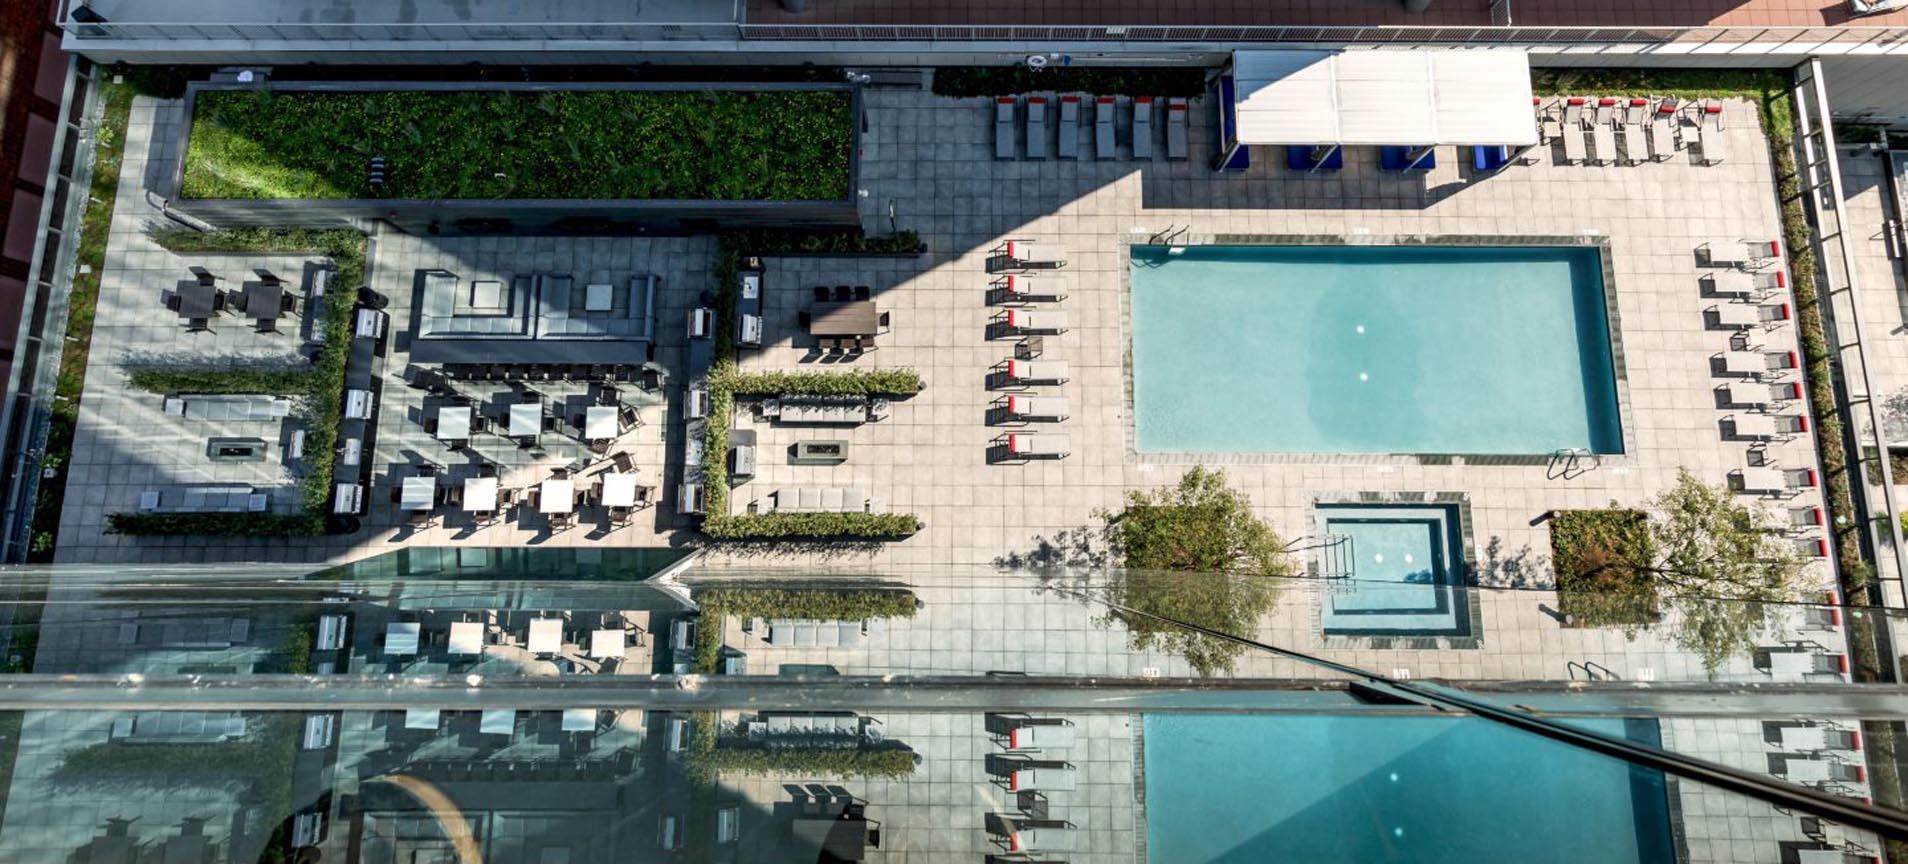 Project Spotlight: Optima II Apartments, Chicago – Pool Deck